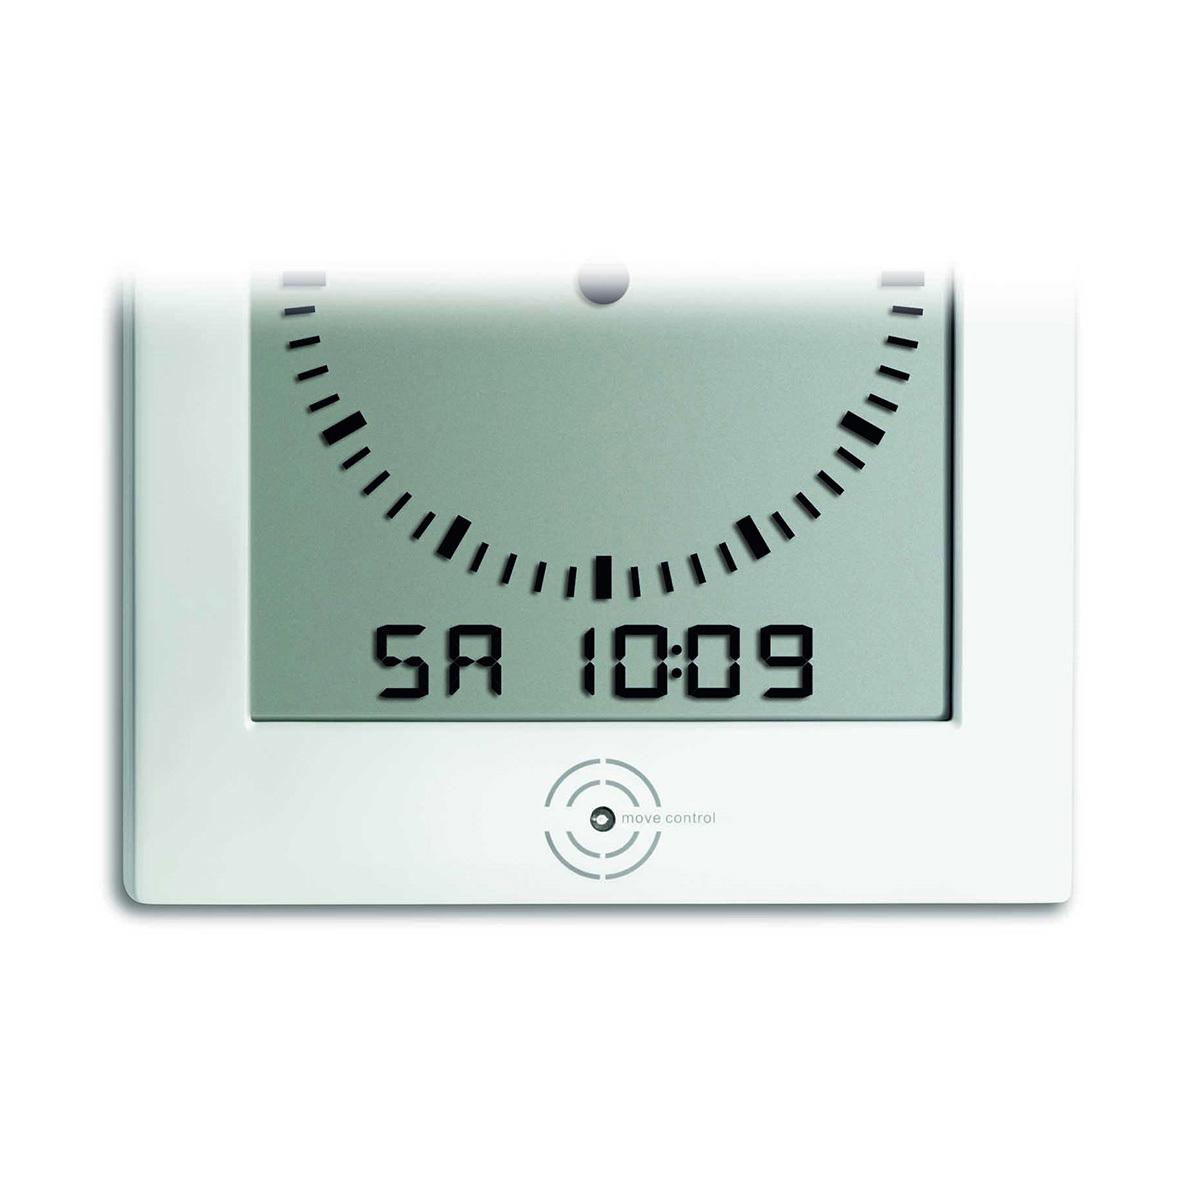 60-4506-digitale-funk-wanduhr-mit-analogem-zifferblatt-raumklima-datum-ansicht-1200x1200px.jpg